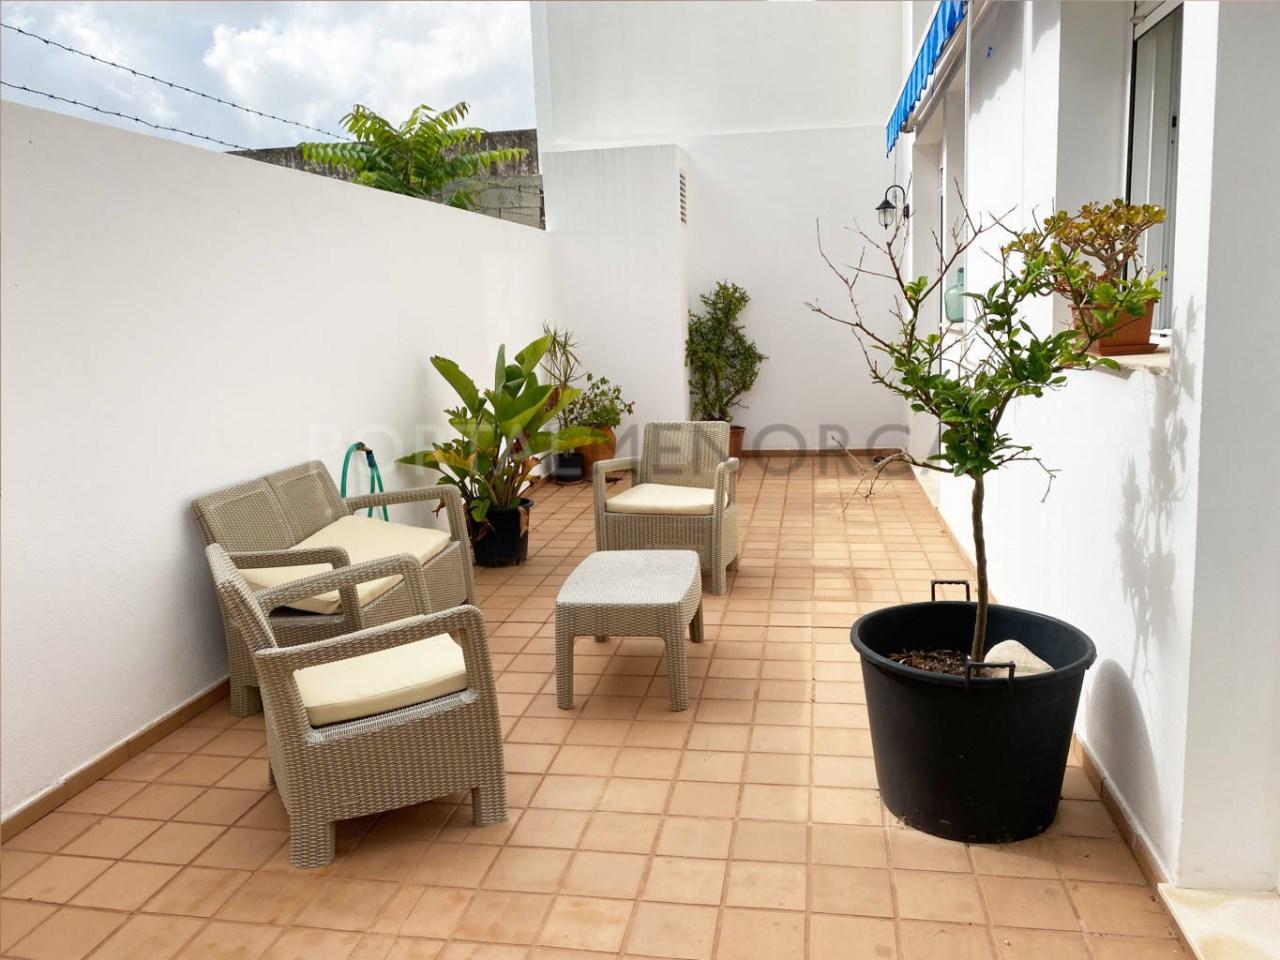 Ground floor in Ciutadella_terrace